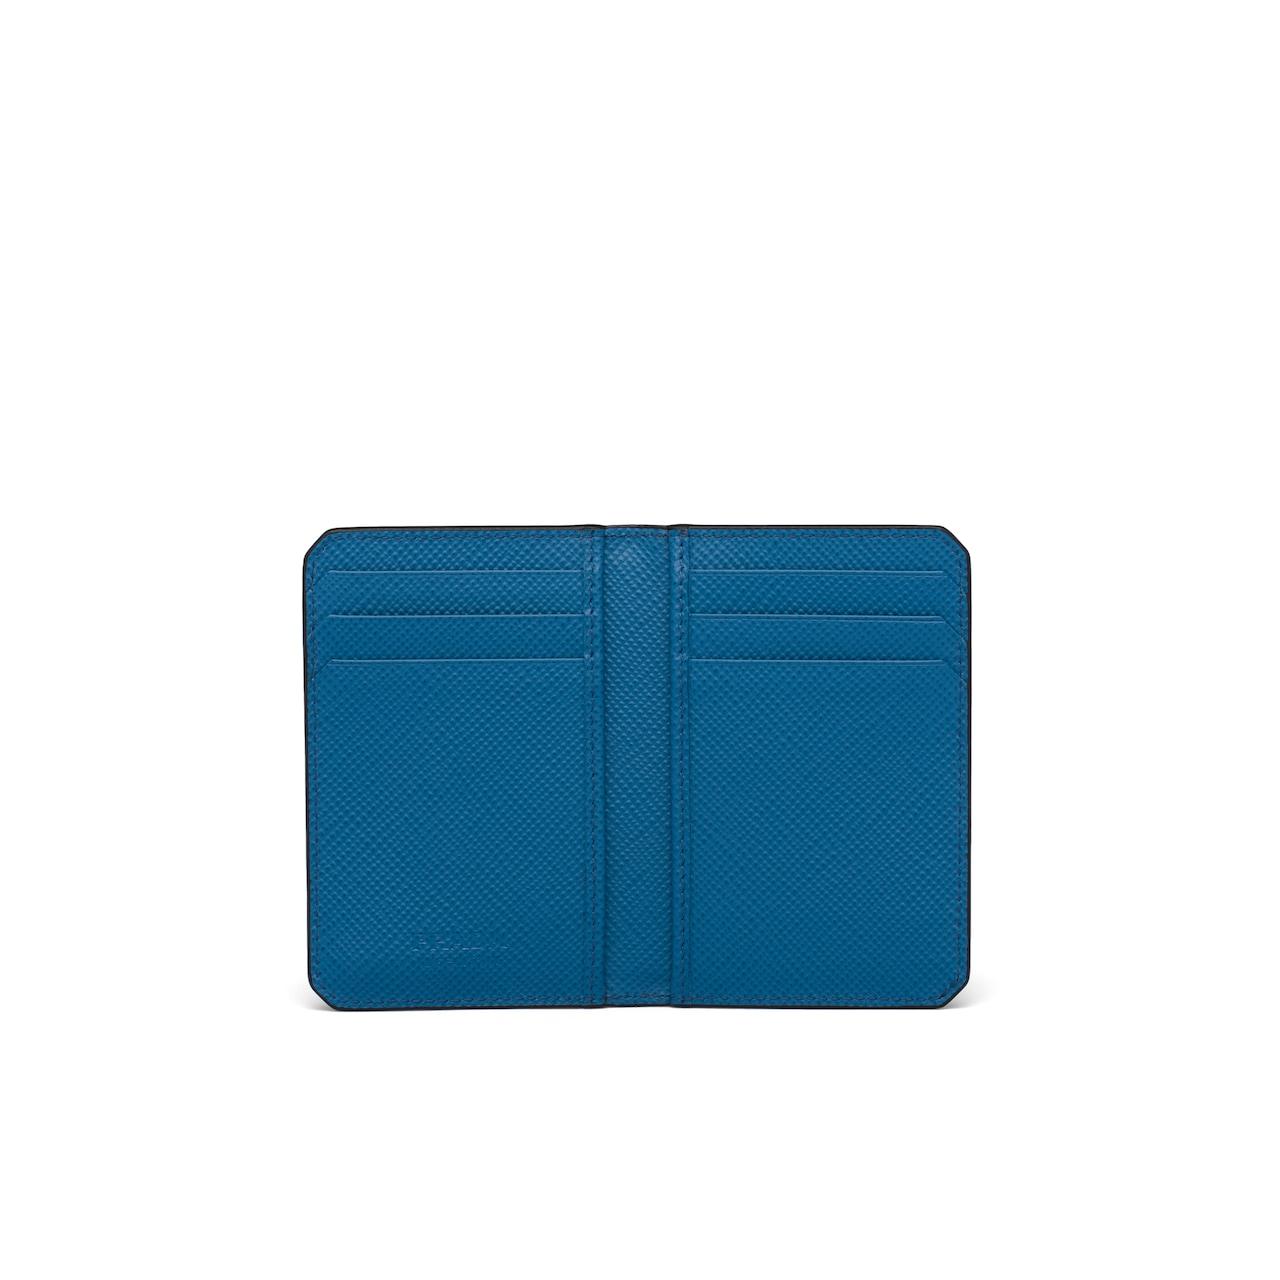 Prada Saffiano Leather Card Holder 4